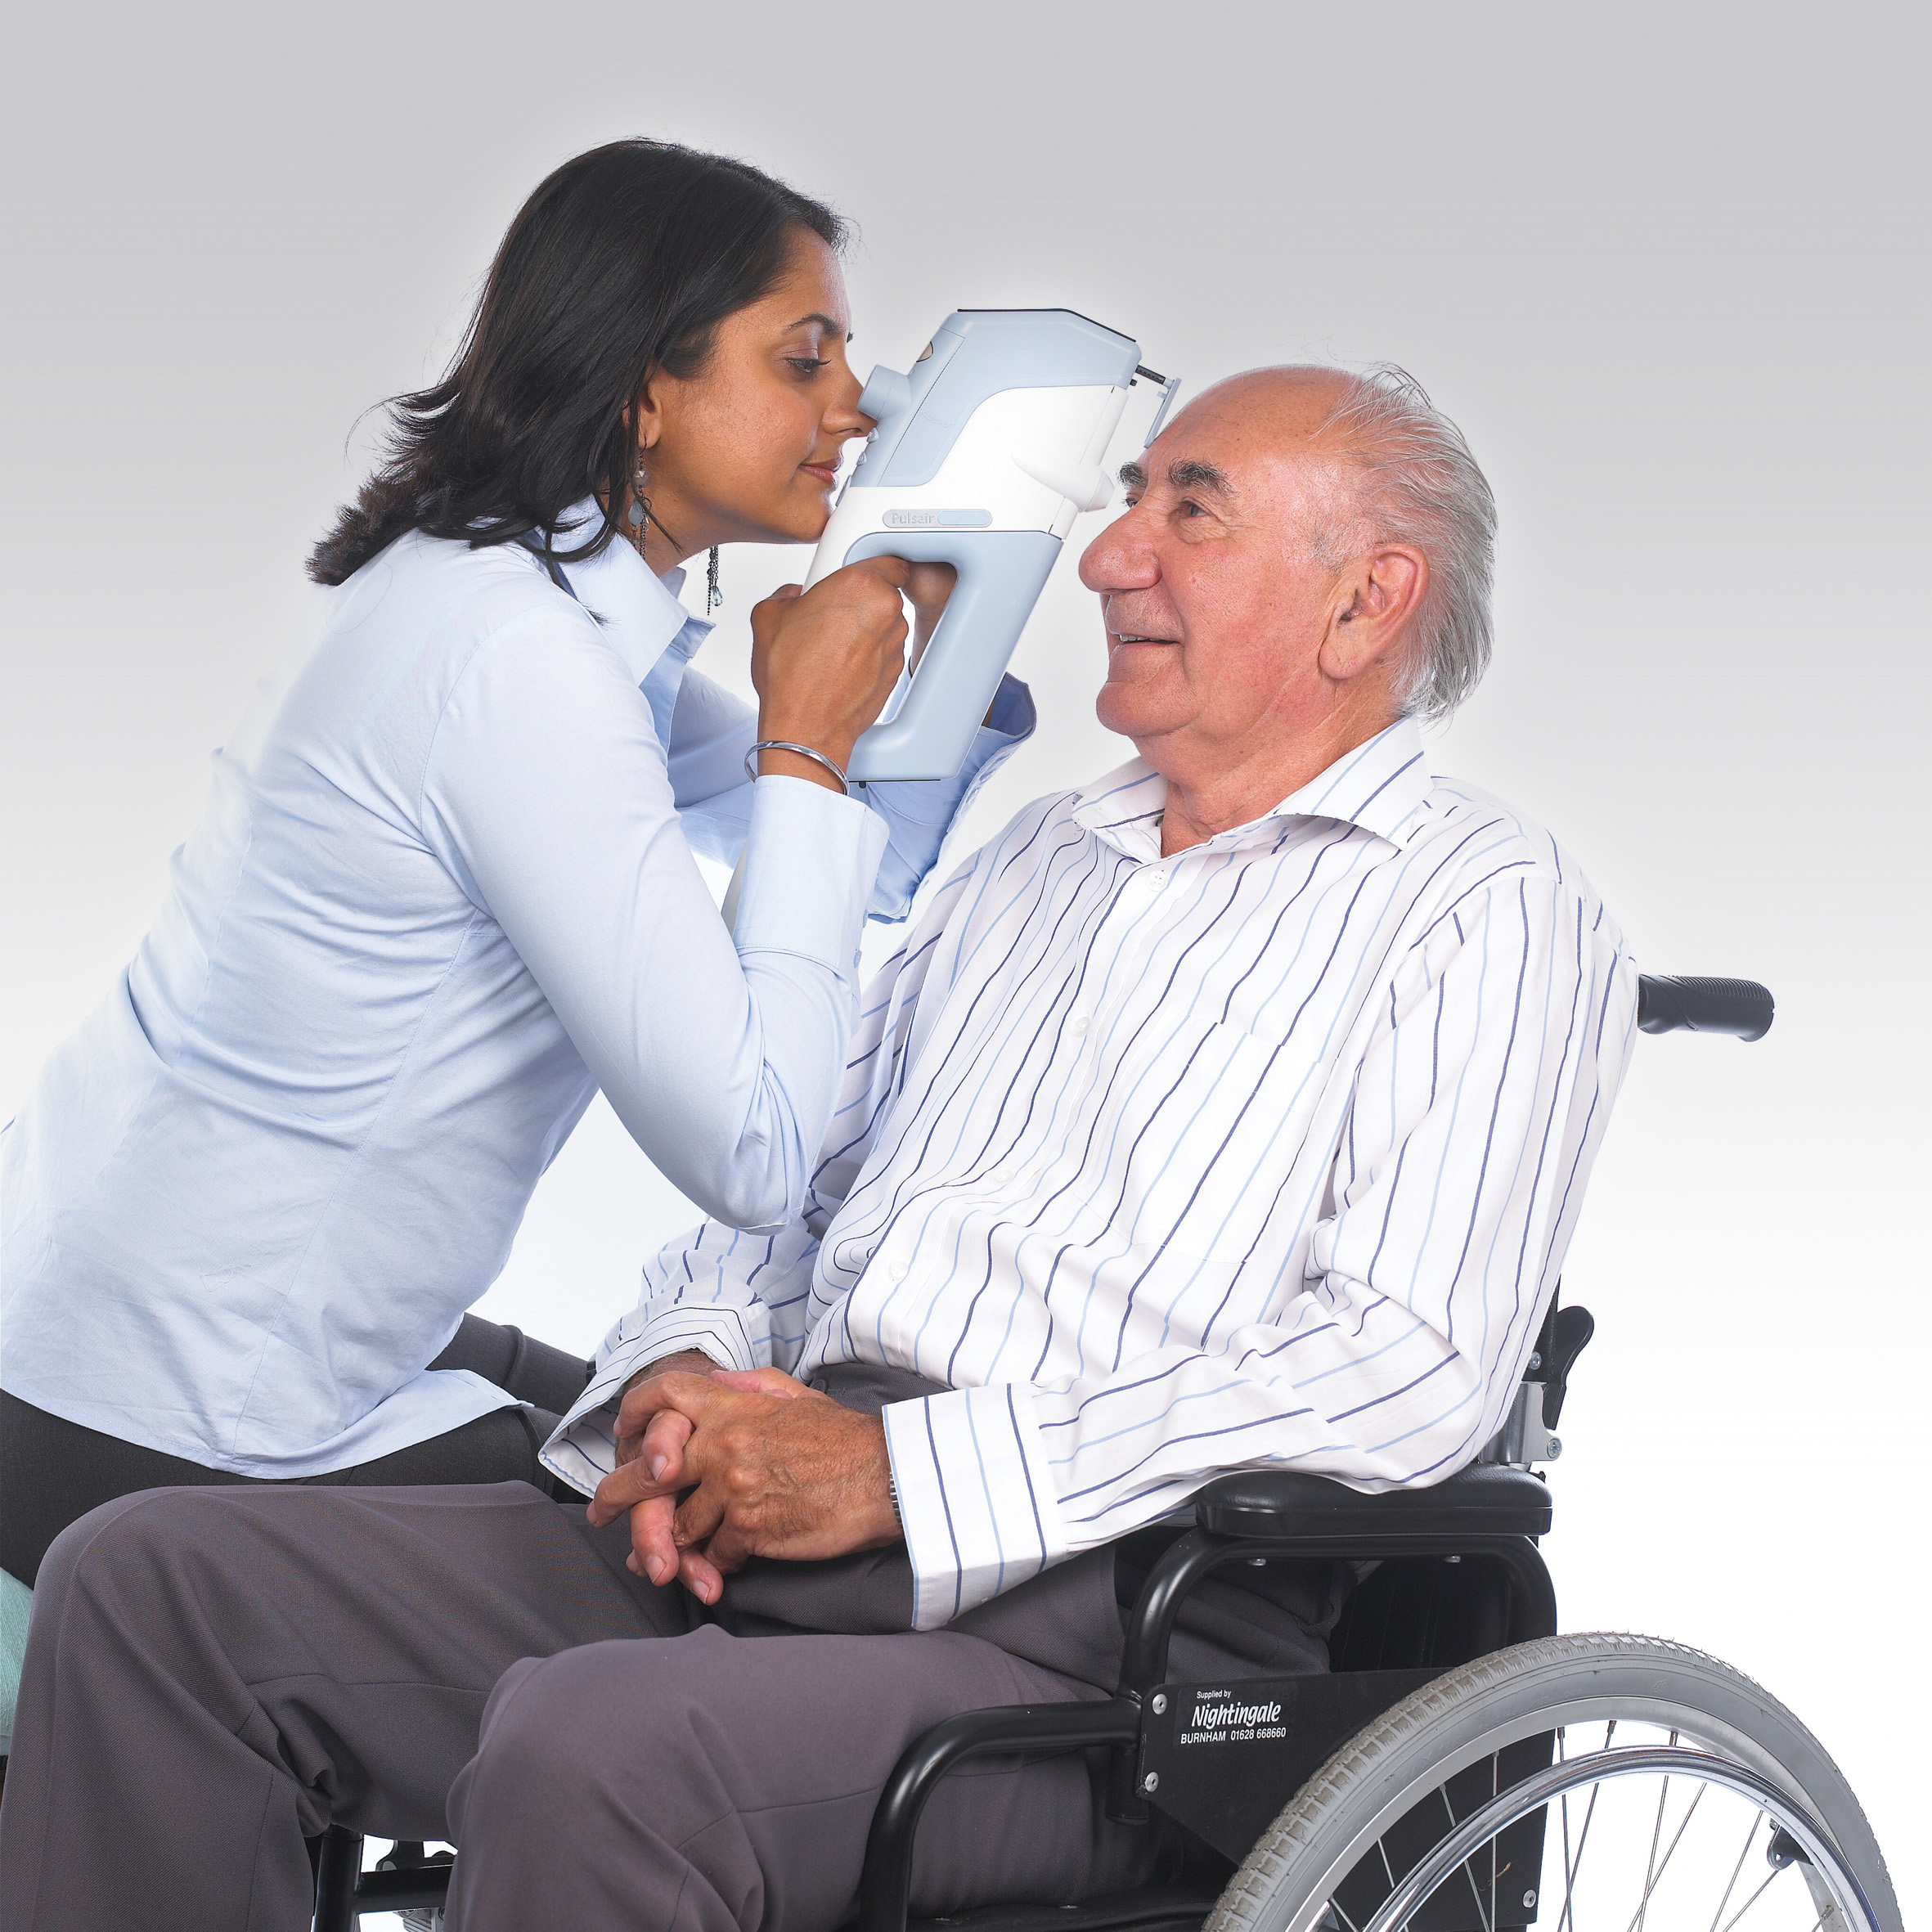 Intellipuff Exam Wheelchair